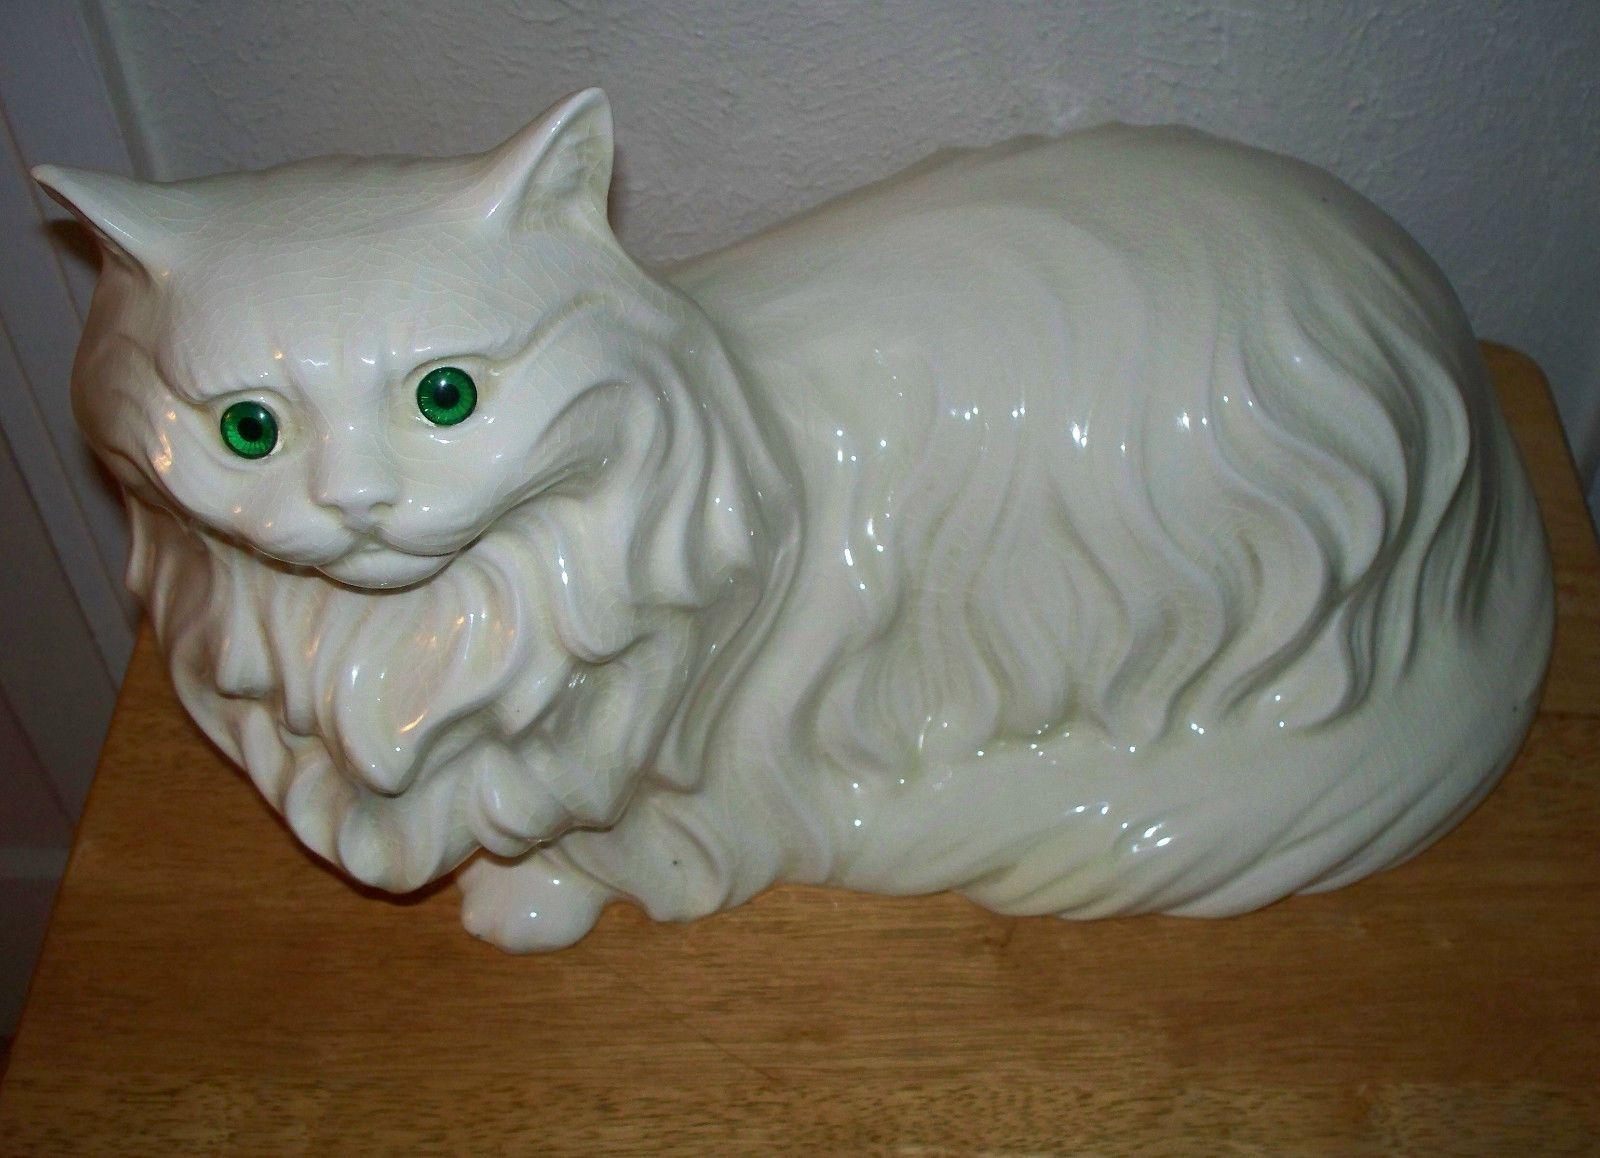 Vintage Large White Persian Cat with Gree Eyes Ceramic